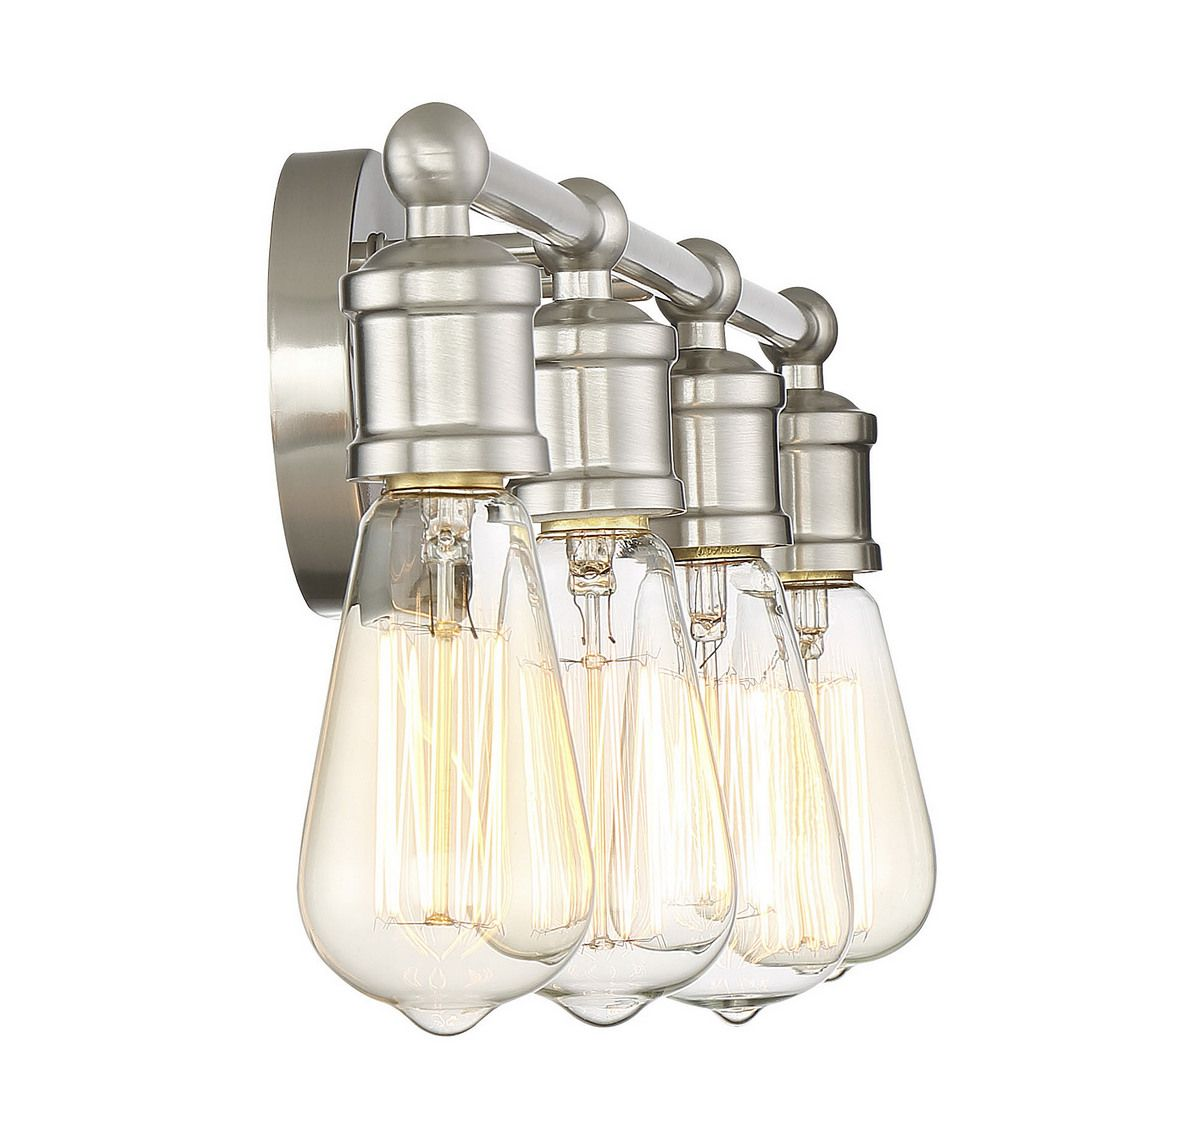 Trade Winds Lighting Industrial 4-Light Bath Bar In